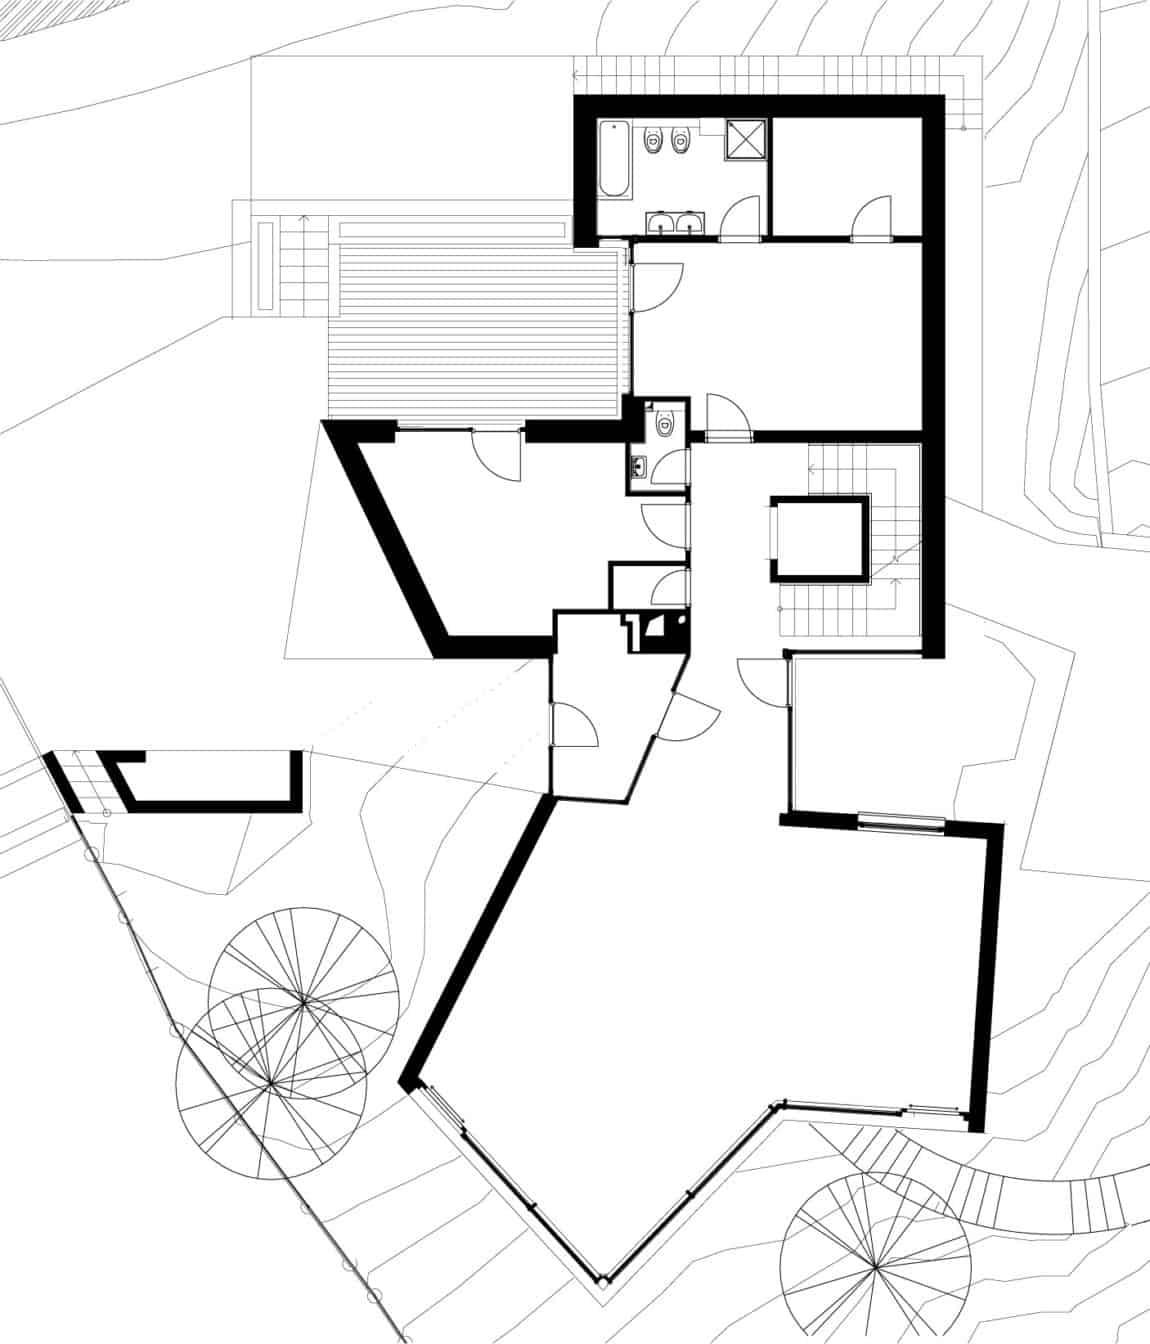 House Between The Trees By Architekti Šebo Lichý (11)